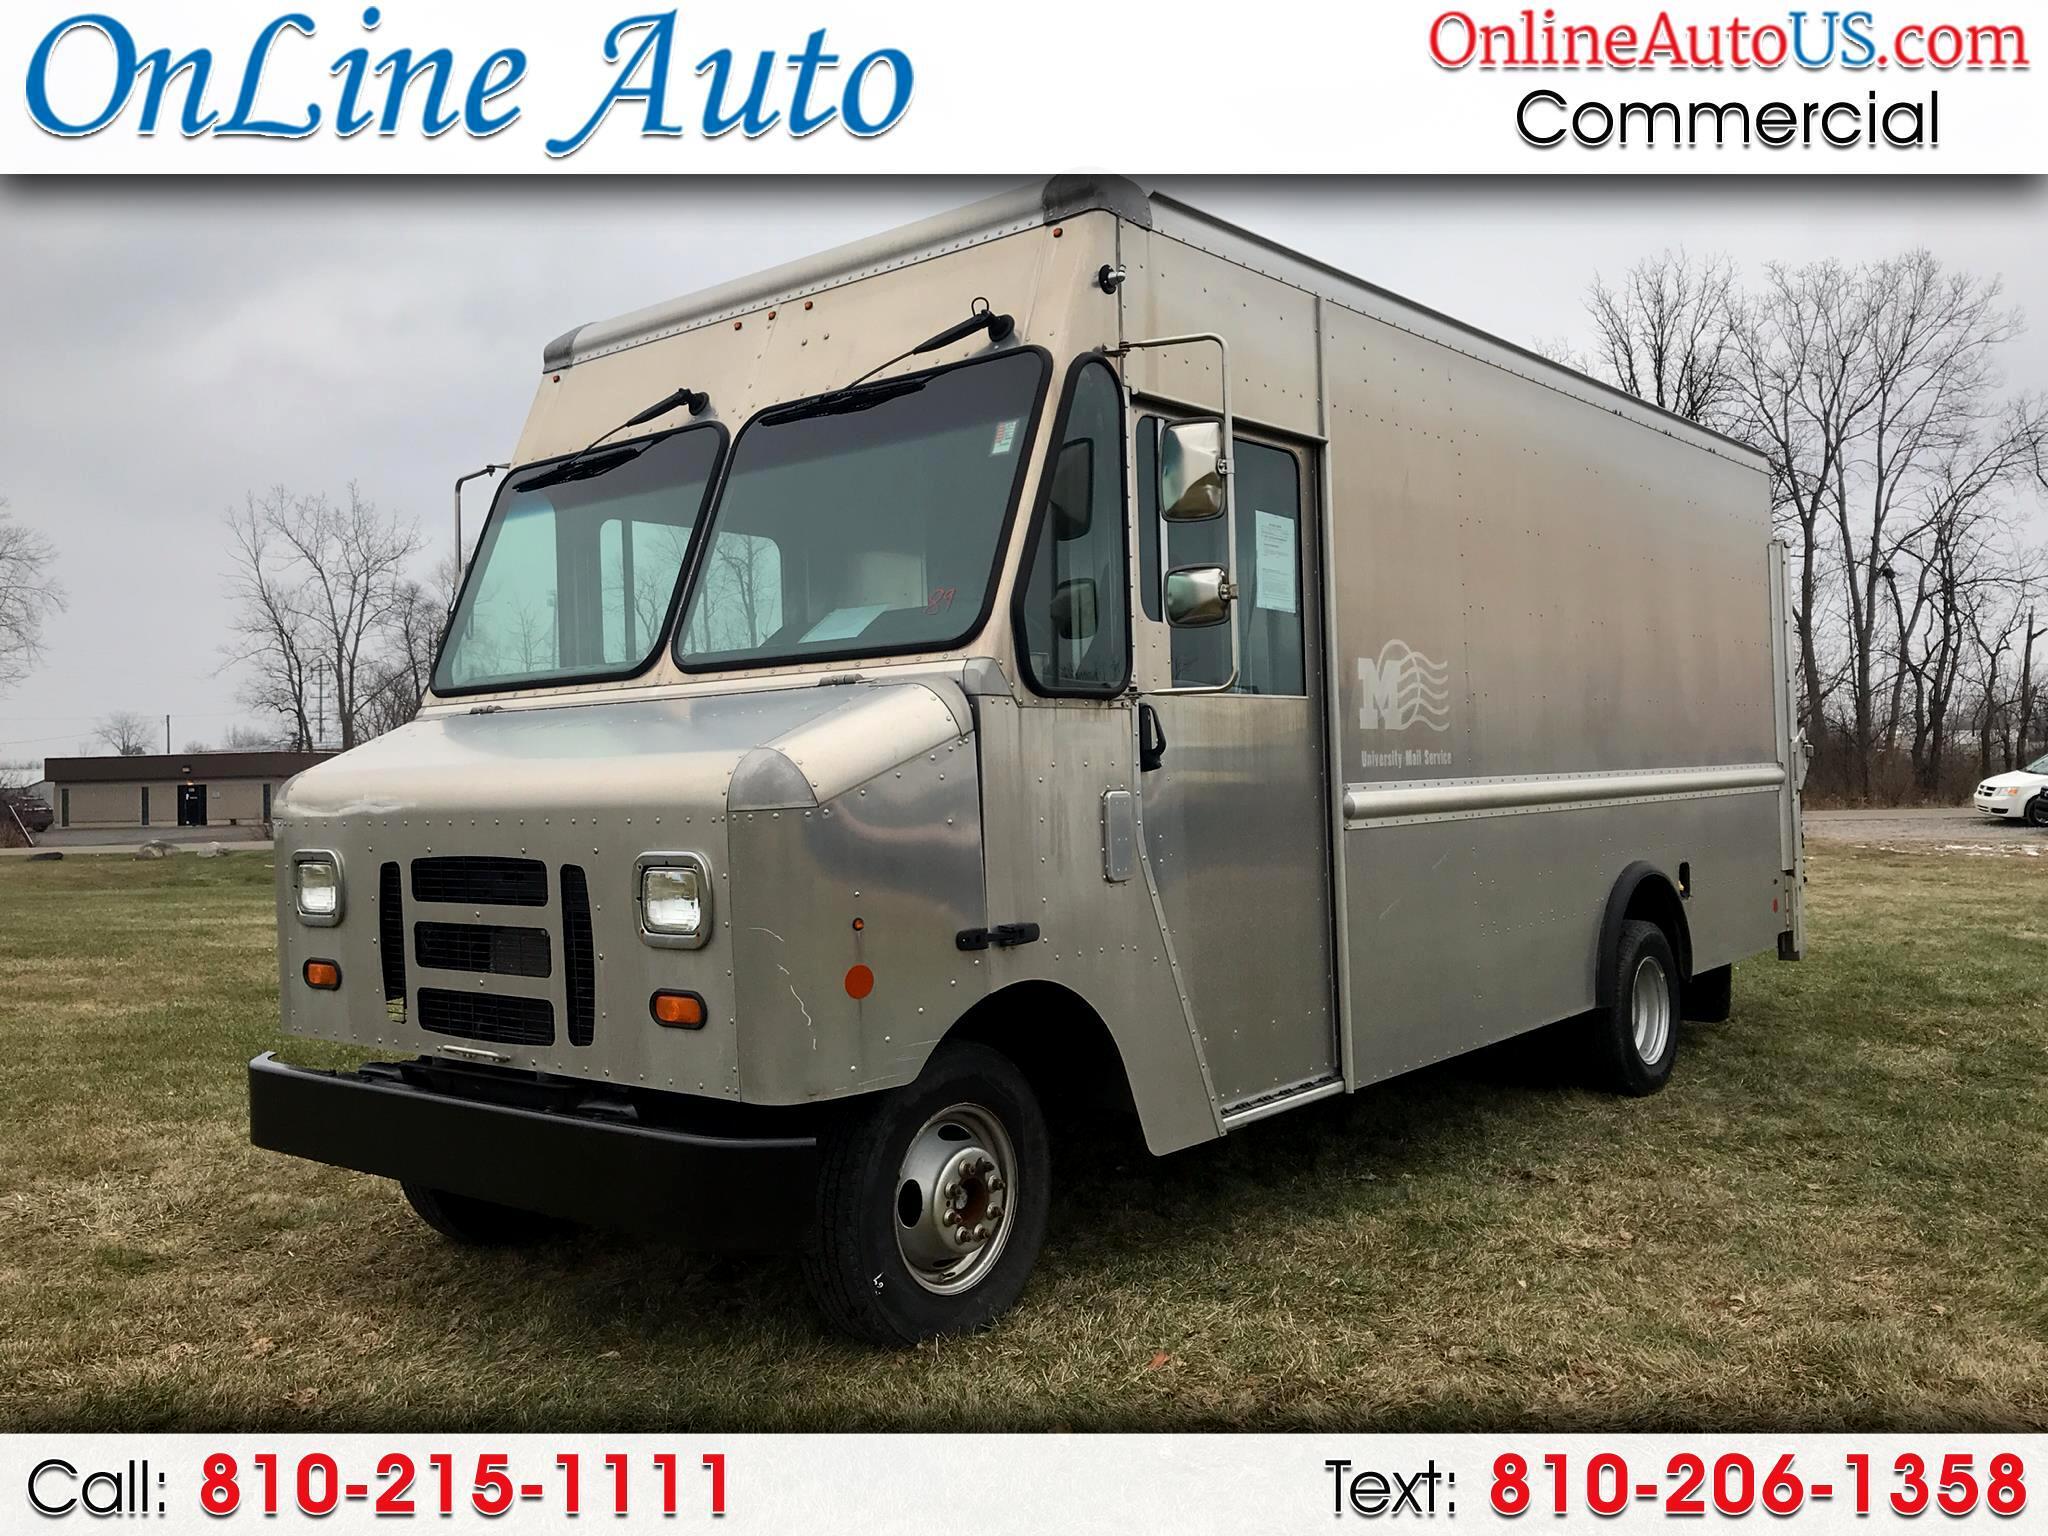 2013 Ford Econoline E-450 14' STEP VAN